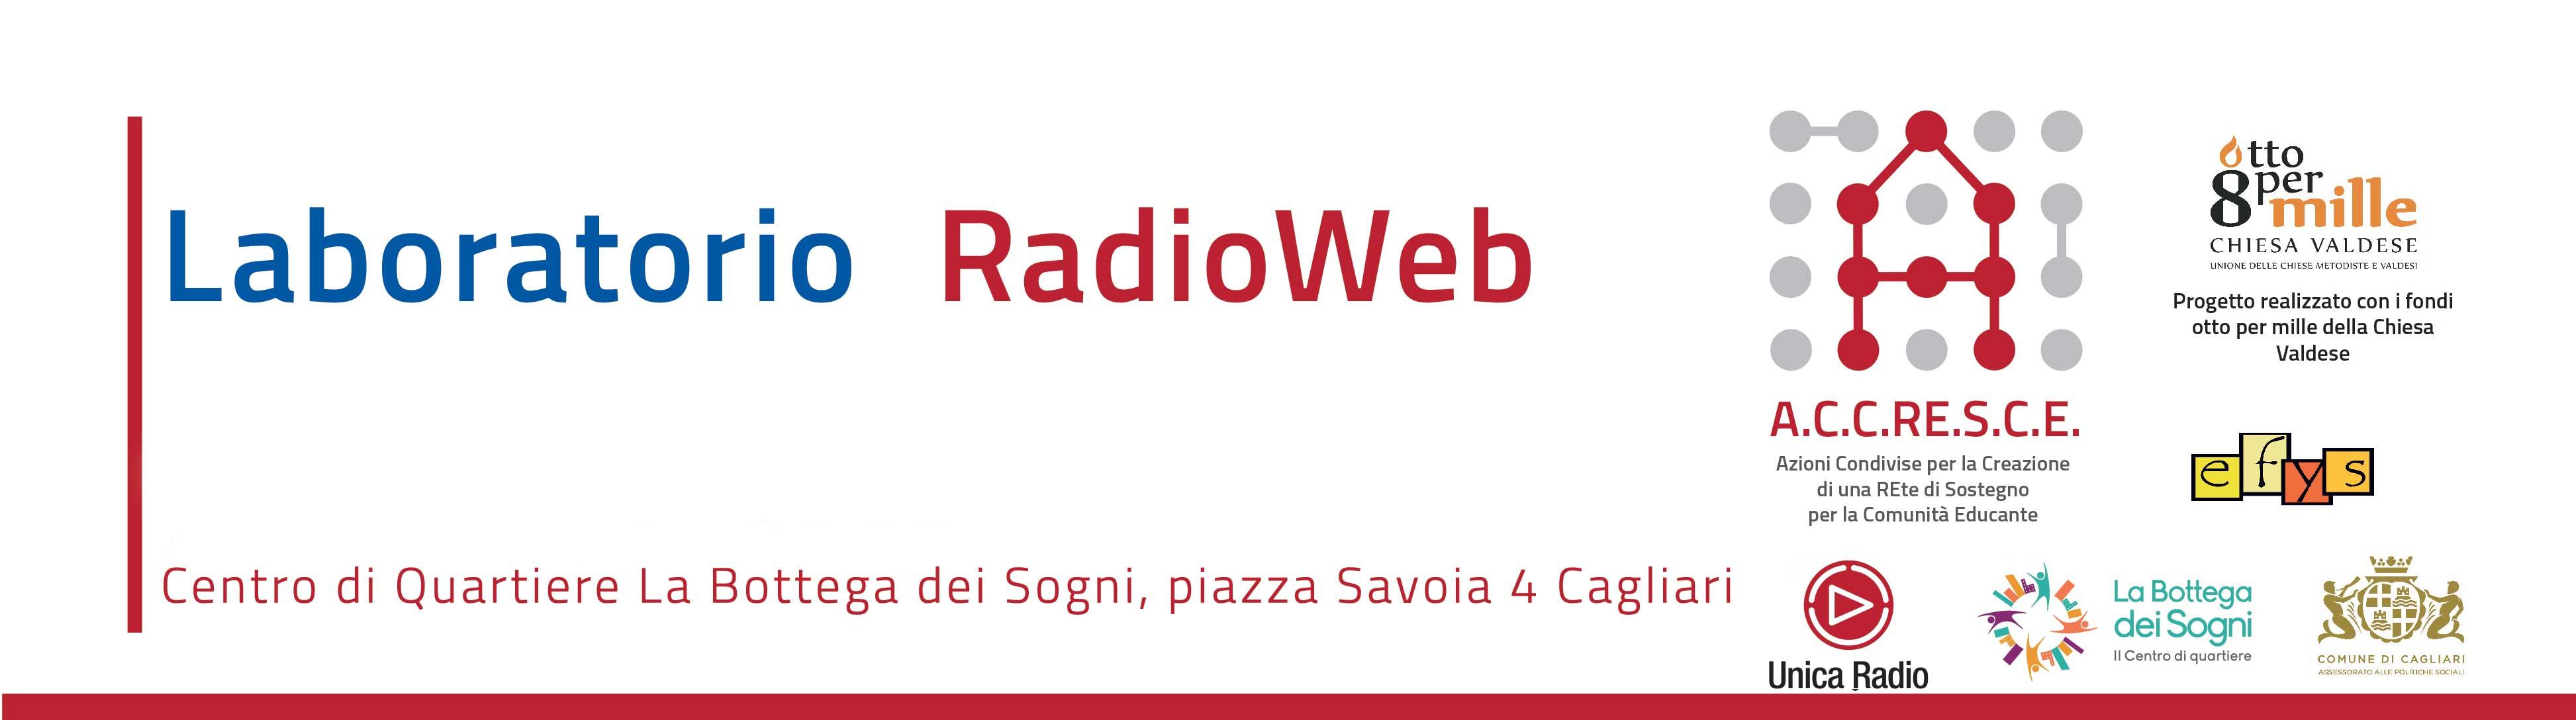 lab radio sito